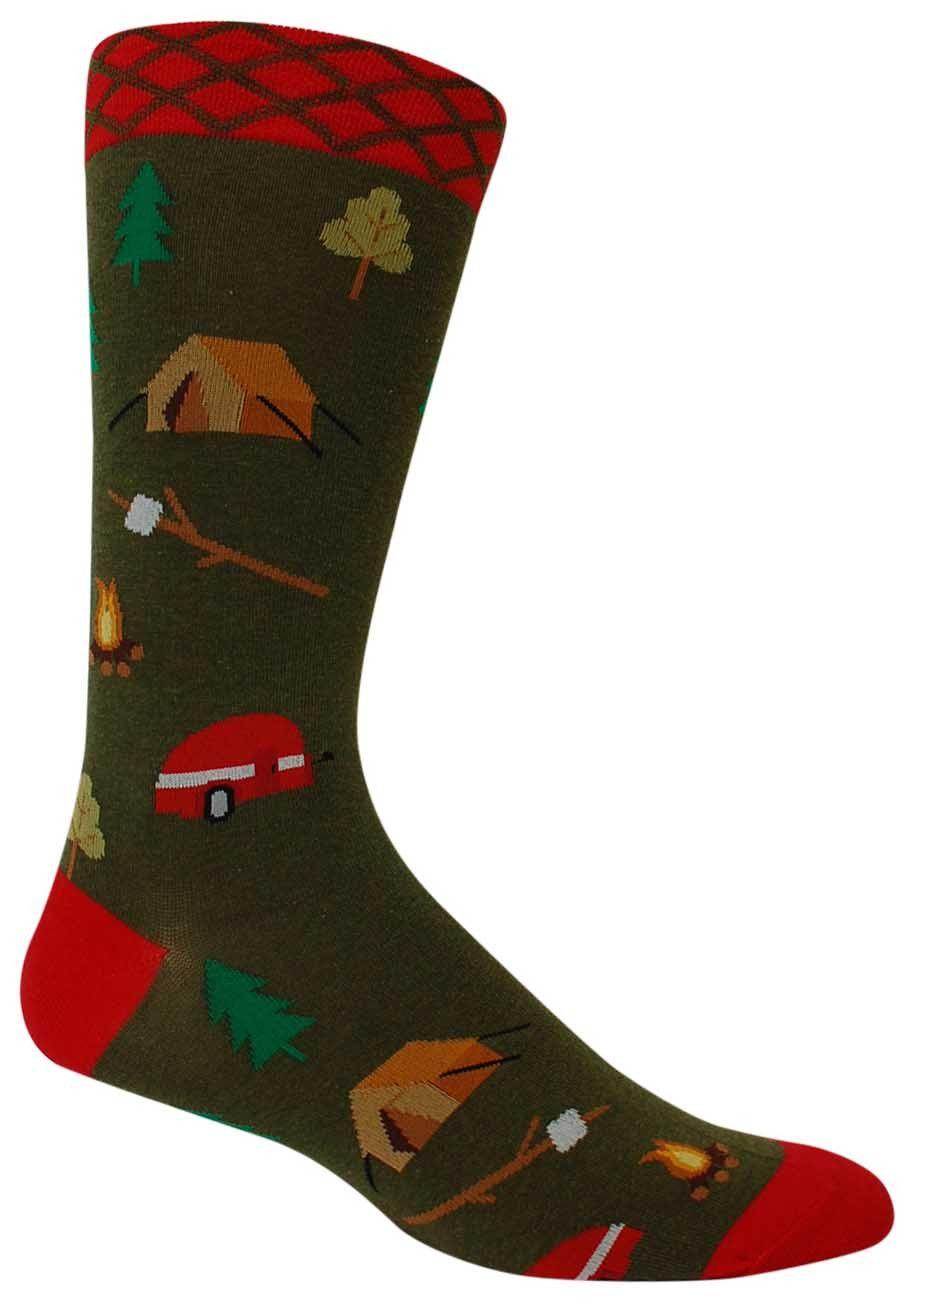 Camping Socks | Mens